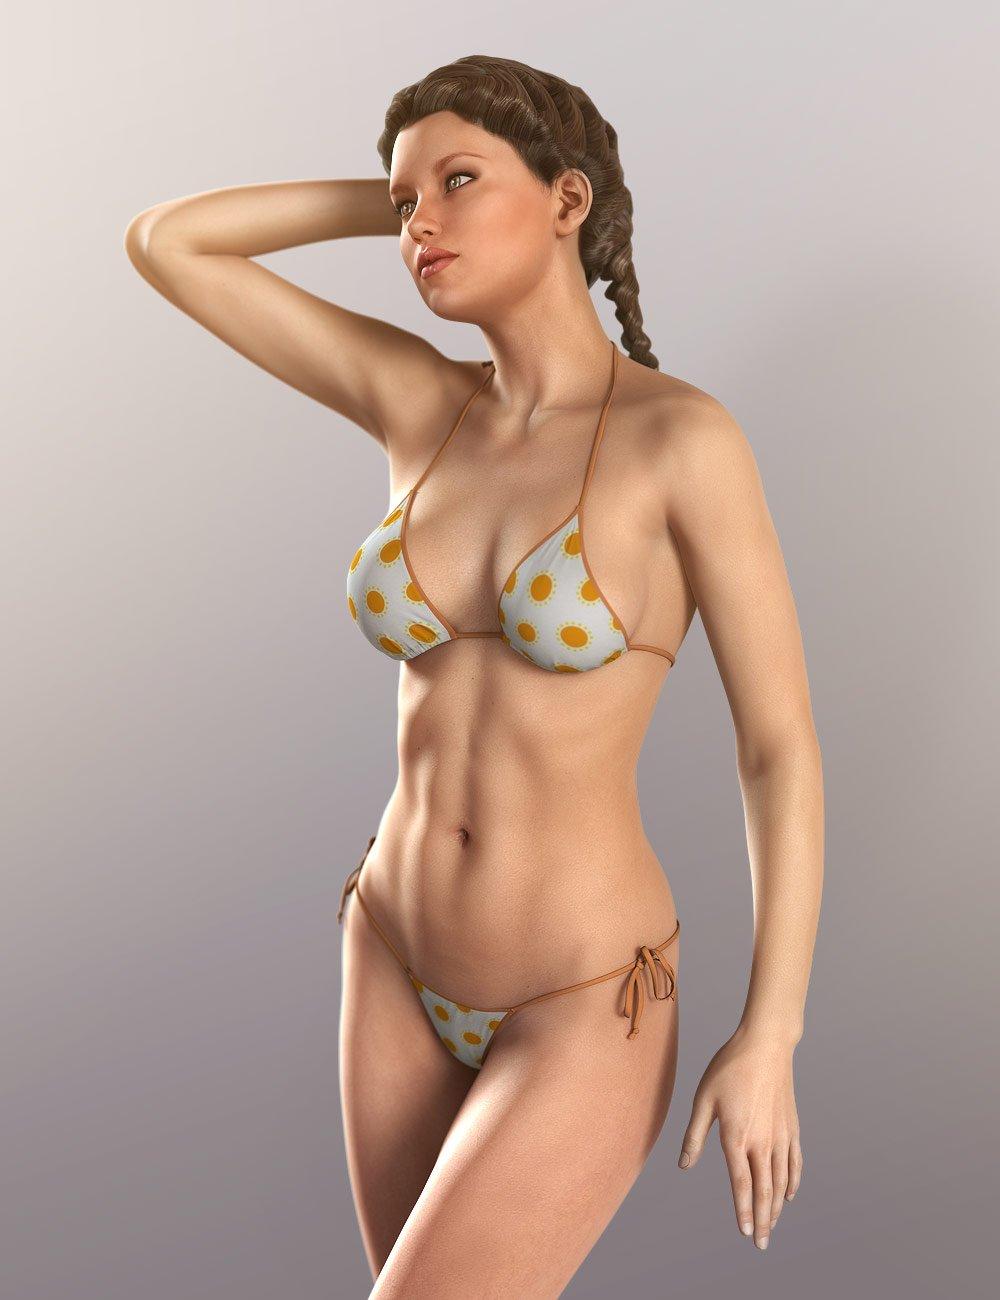 Hongyu's Bikini for V6 by: hongyu, 3D Models by Daz 3D